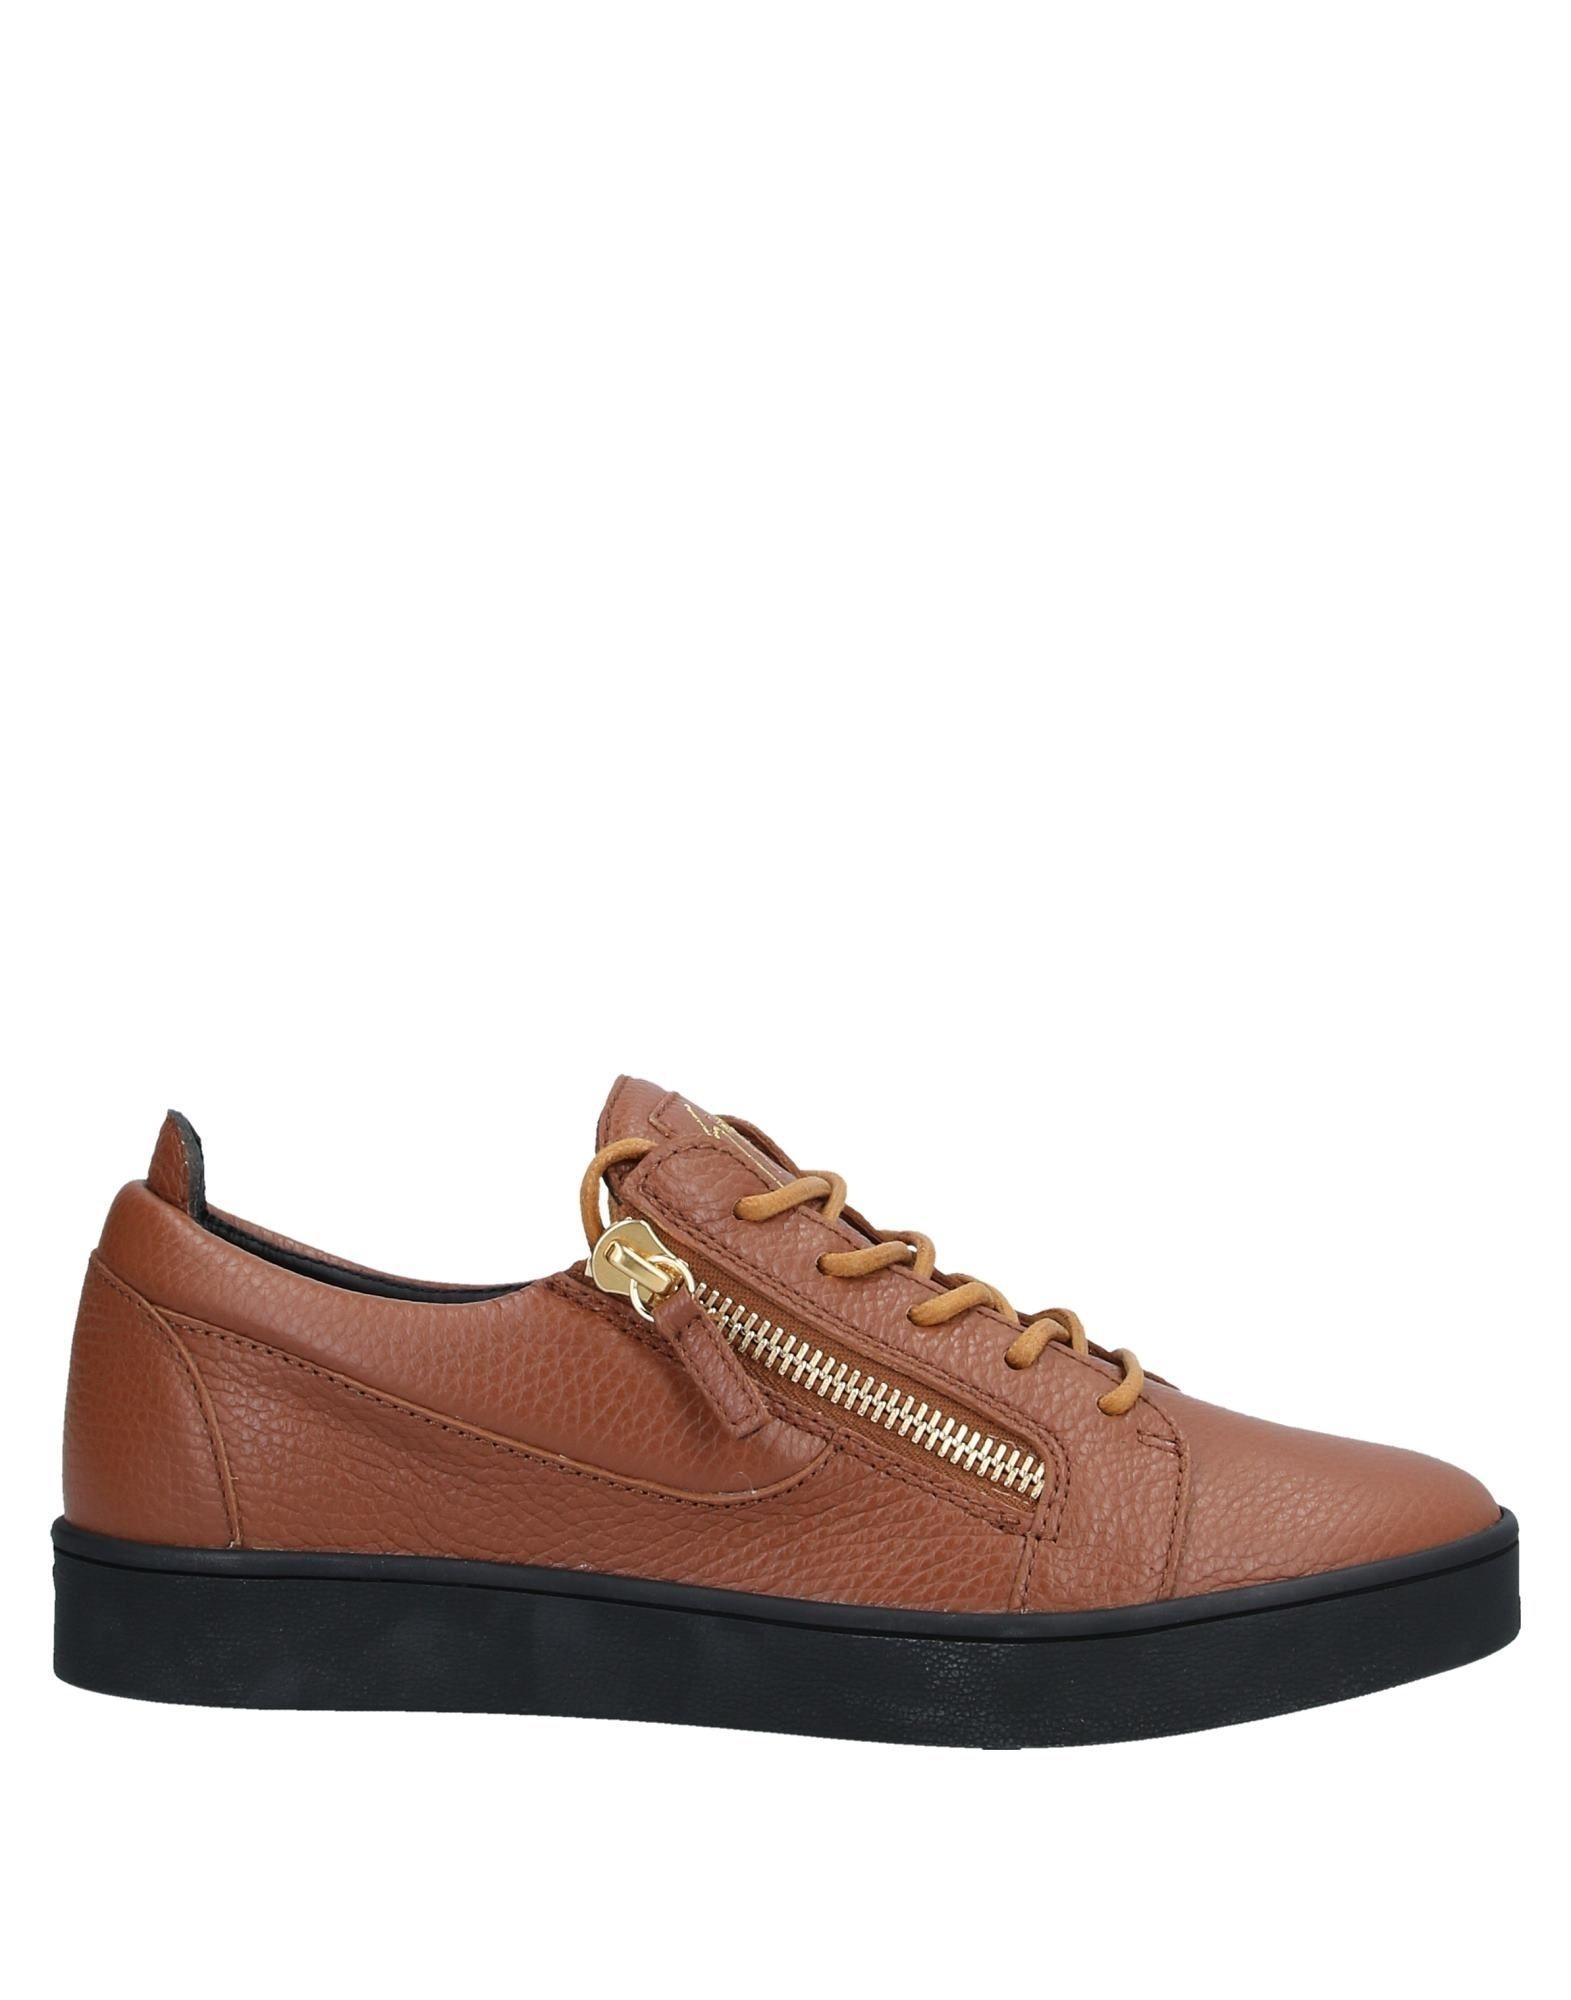 GIUSEPPE ZANOTTI Низкие кеды и кроссовки giuseppe zanotti низкие кеды и кроссовки